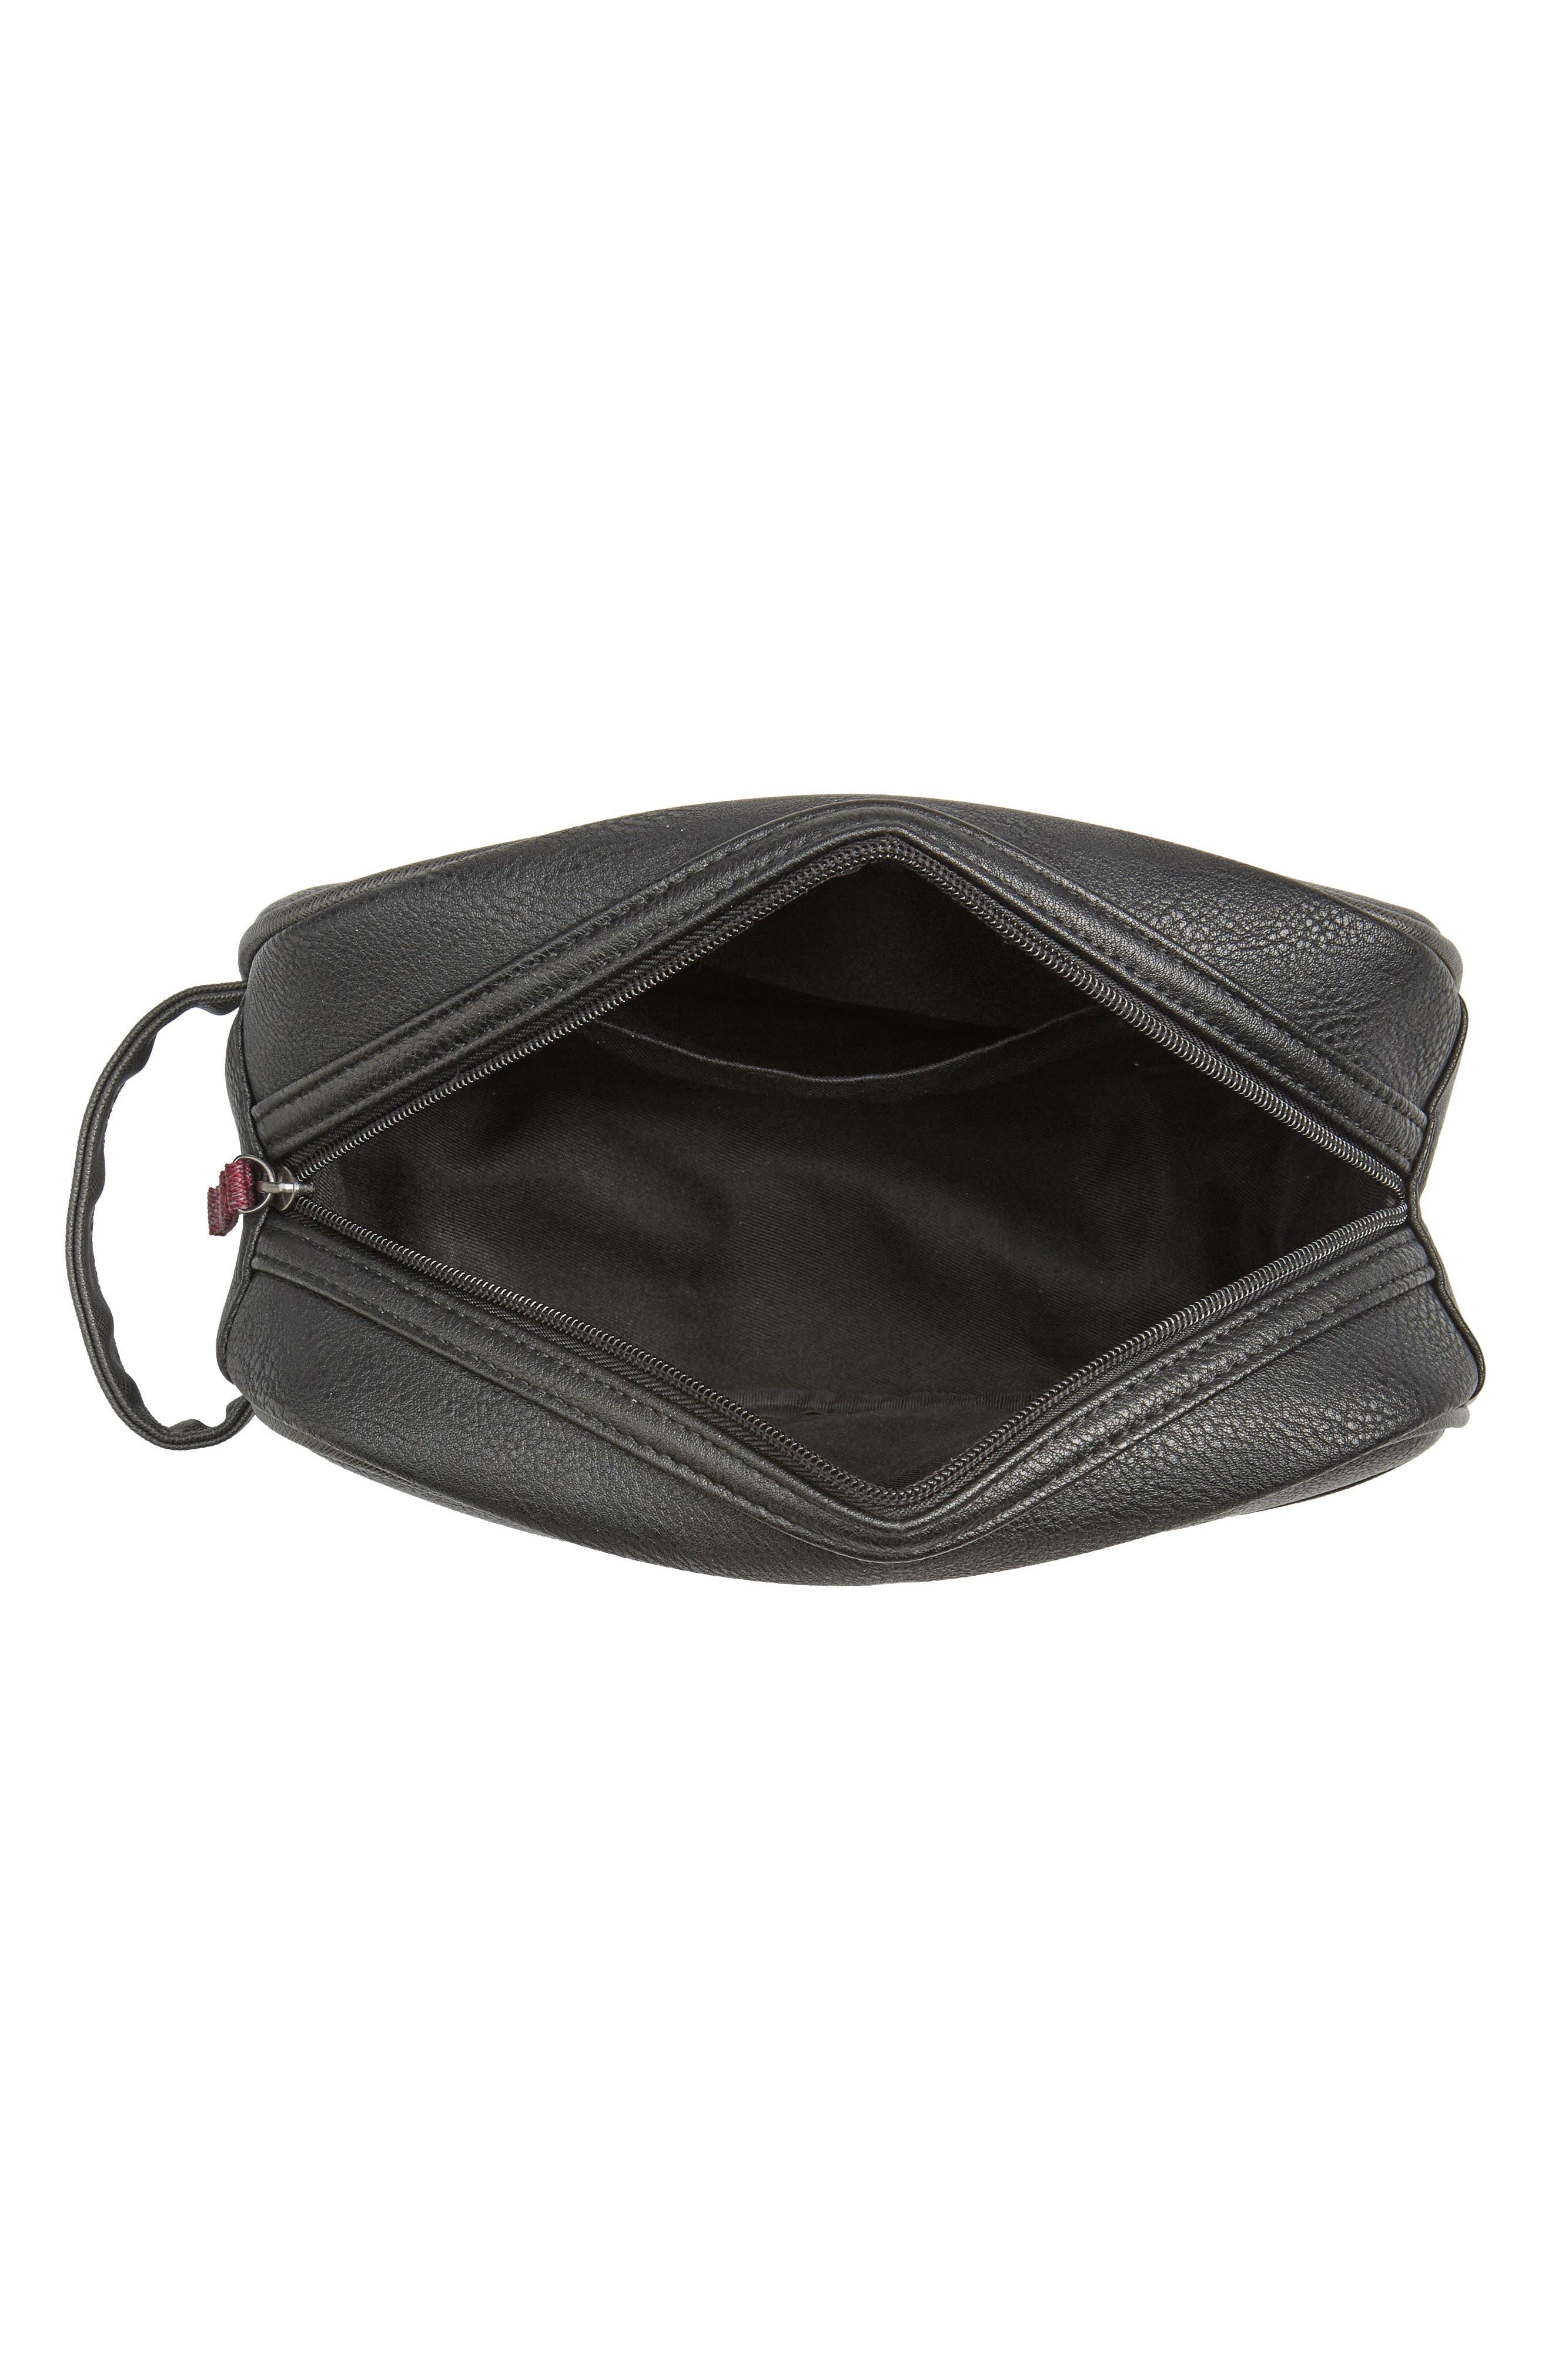 Pidgy Faux Leather Travel Kit,                             Alternate thumbnail 3, color,                             001